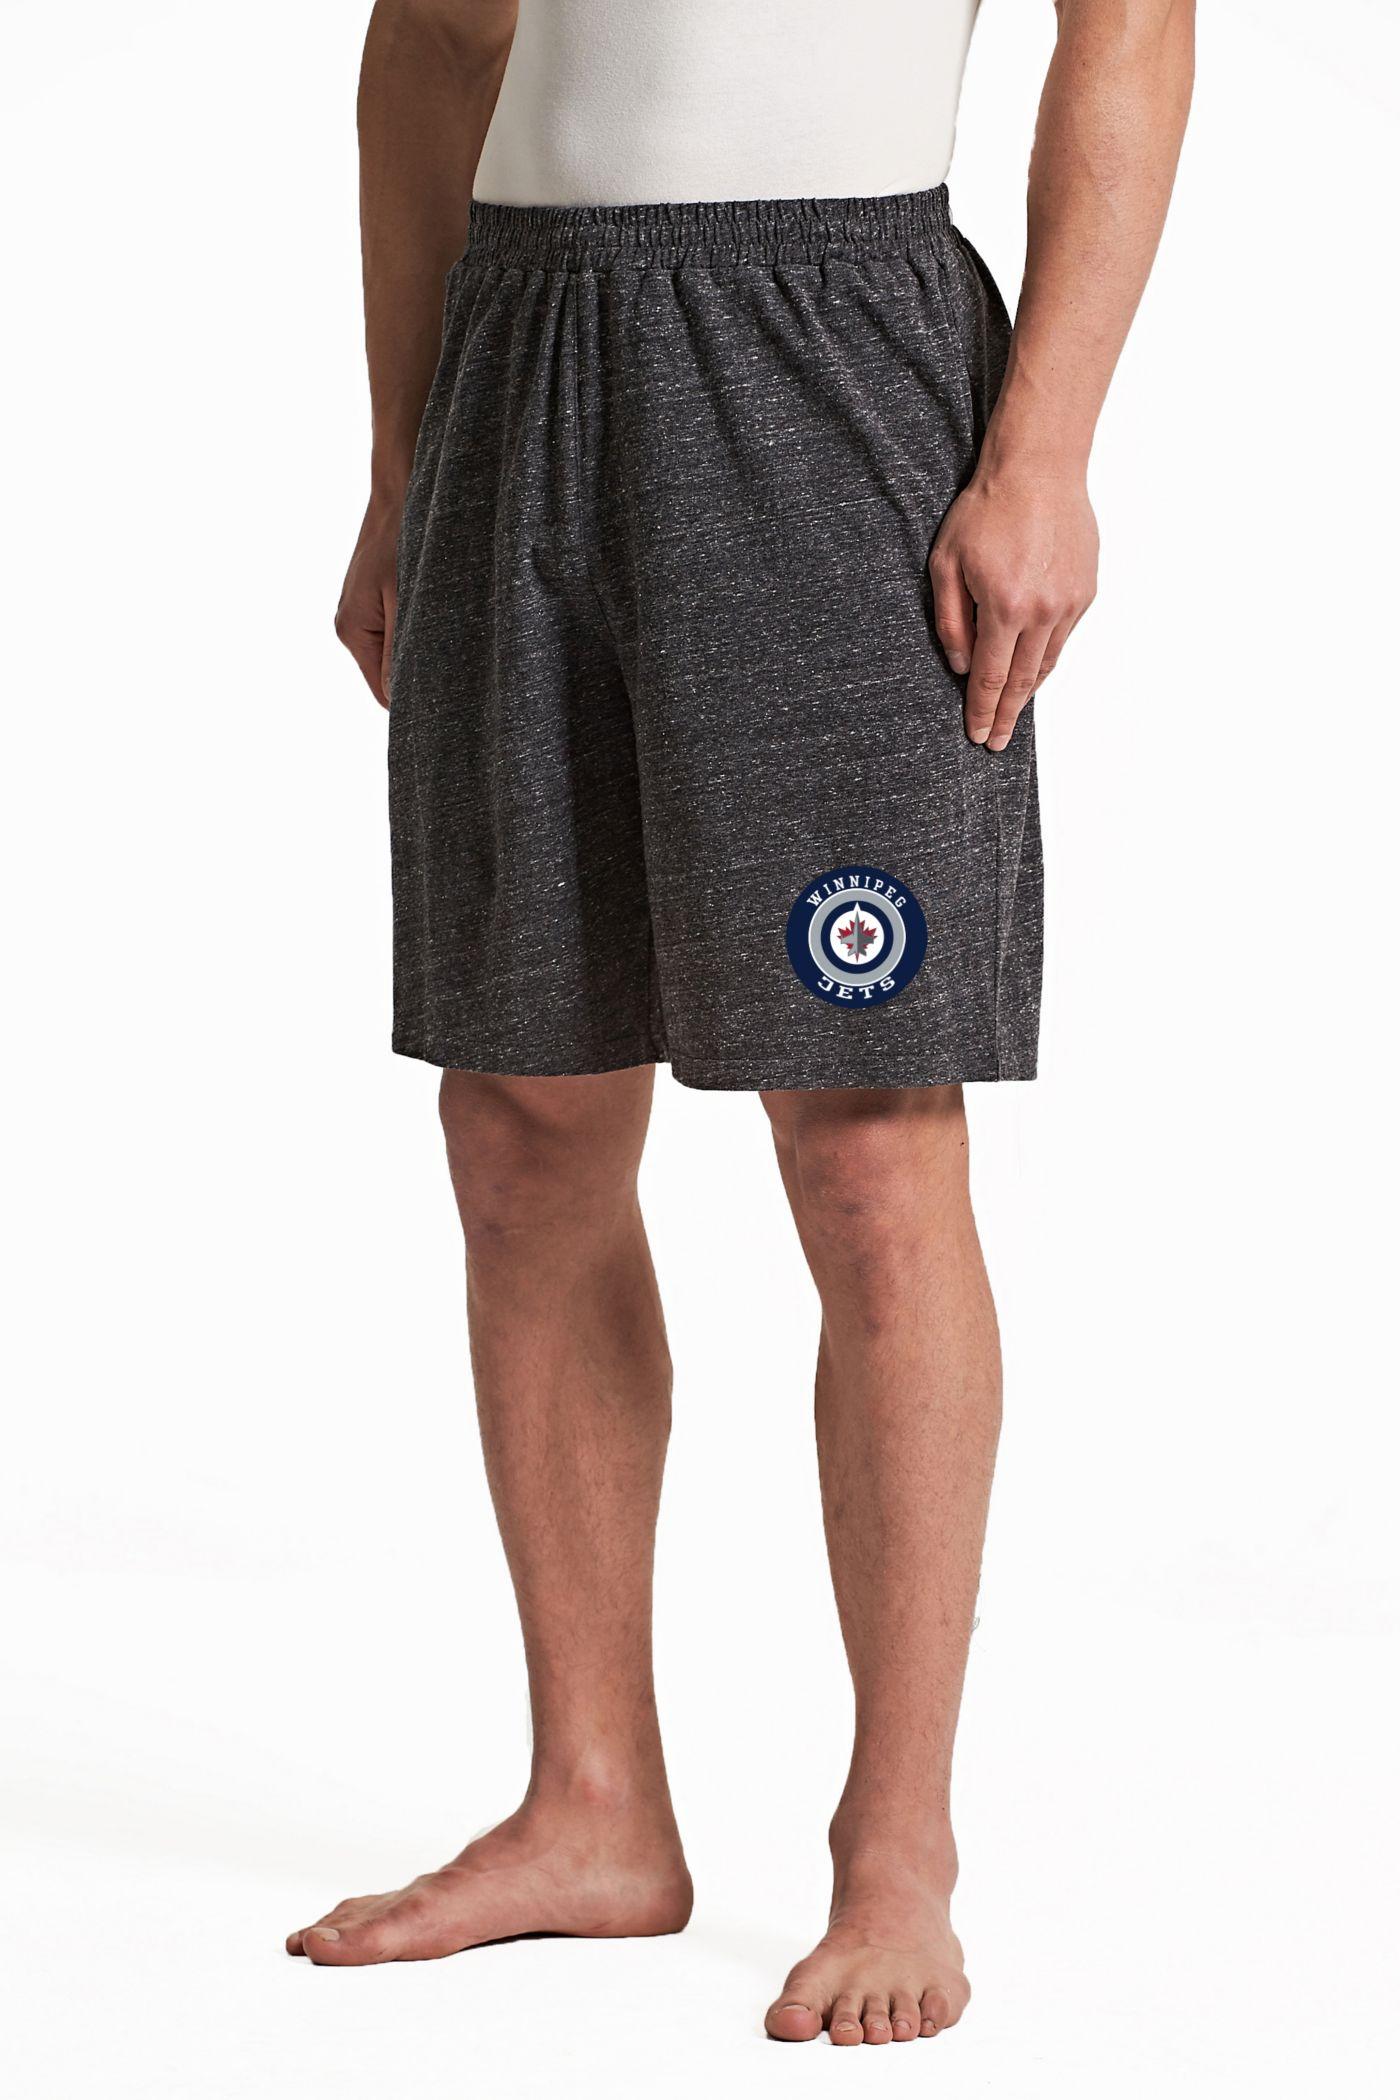 Concepts Sport Men's Winnipeg Jets Pitch Grey Shorts